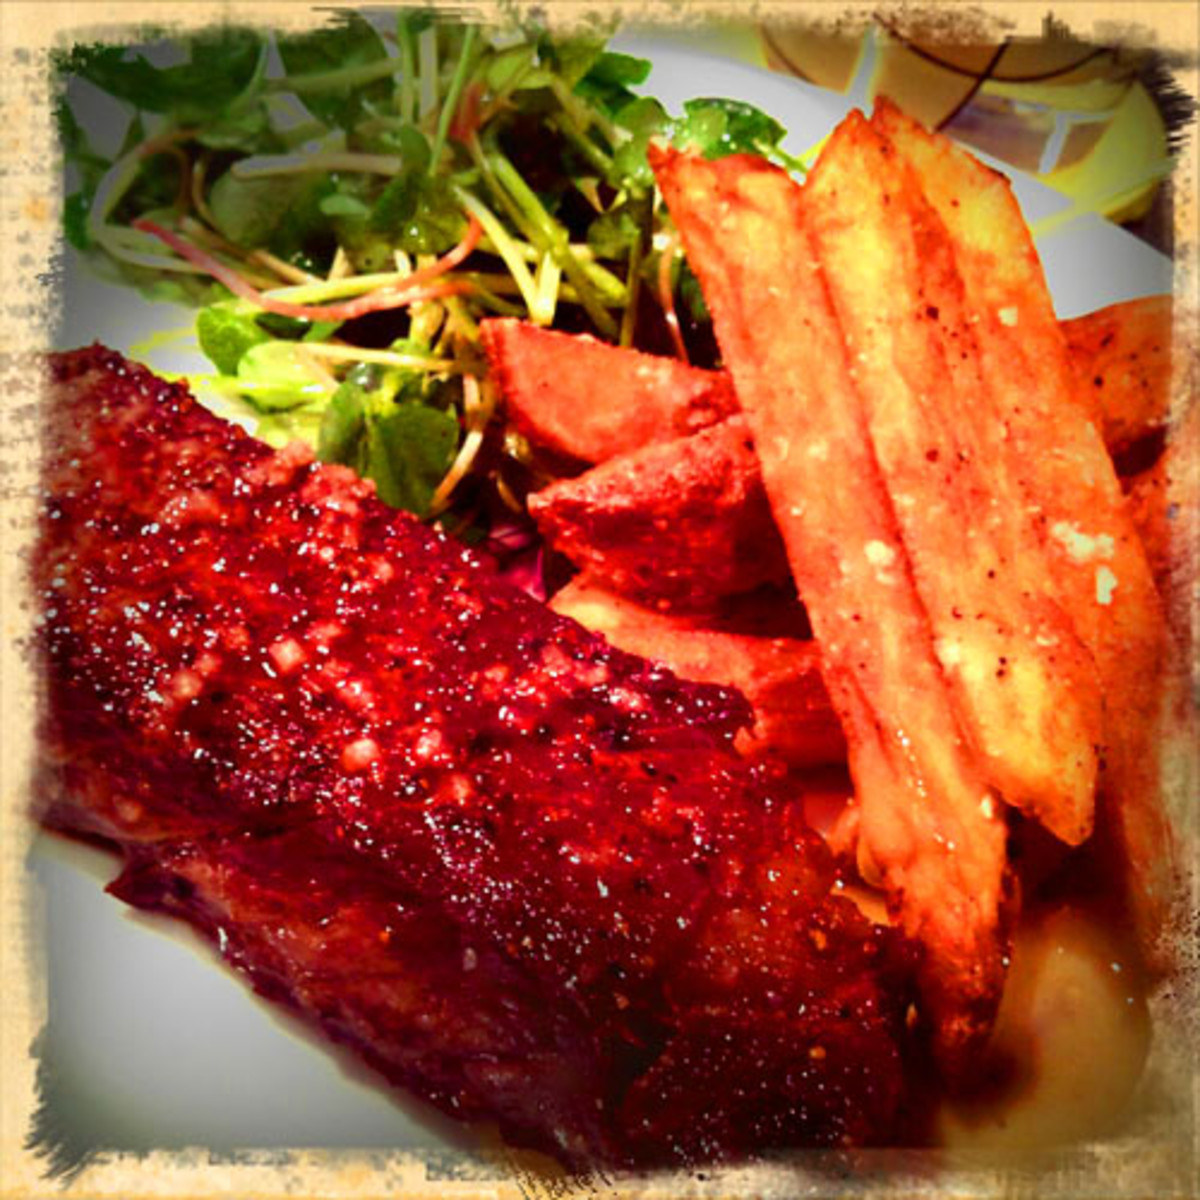 Midnight in Paris_steak frites_homemade fries